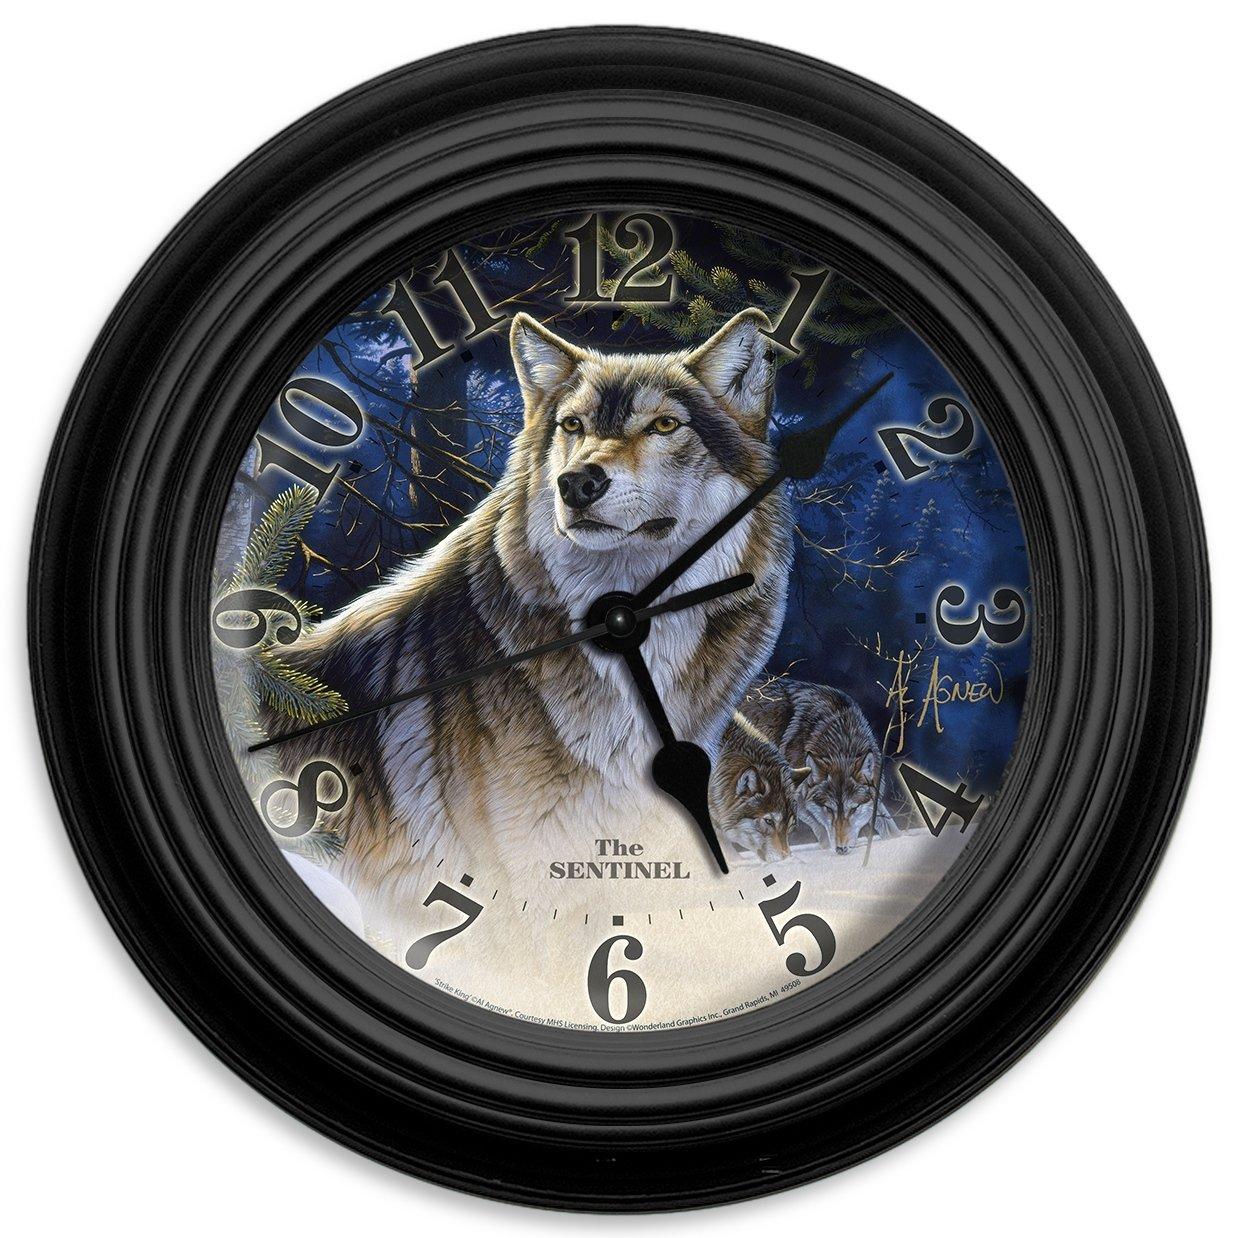 Reflective Art the Sentinel Wall Clock, 10-Inch